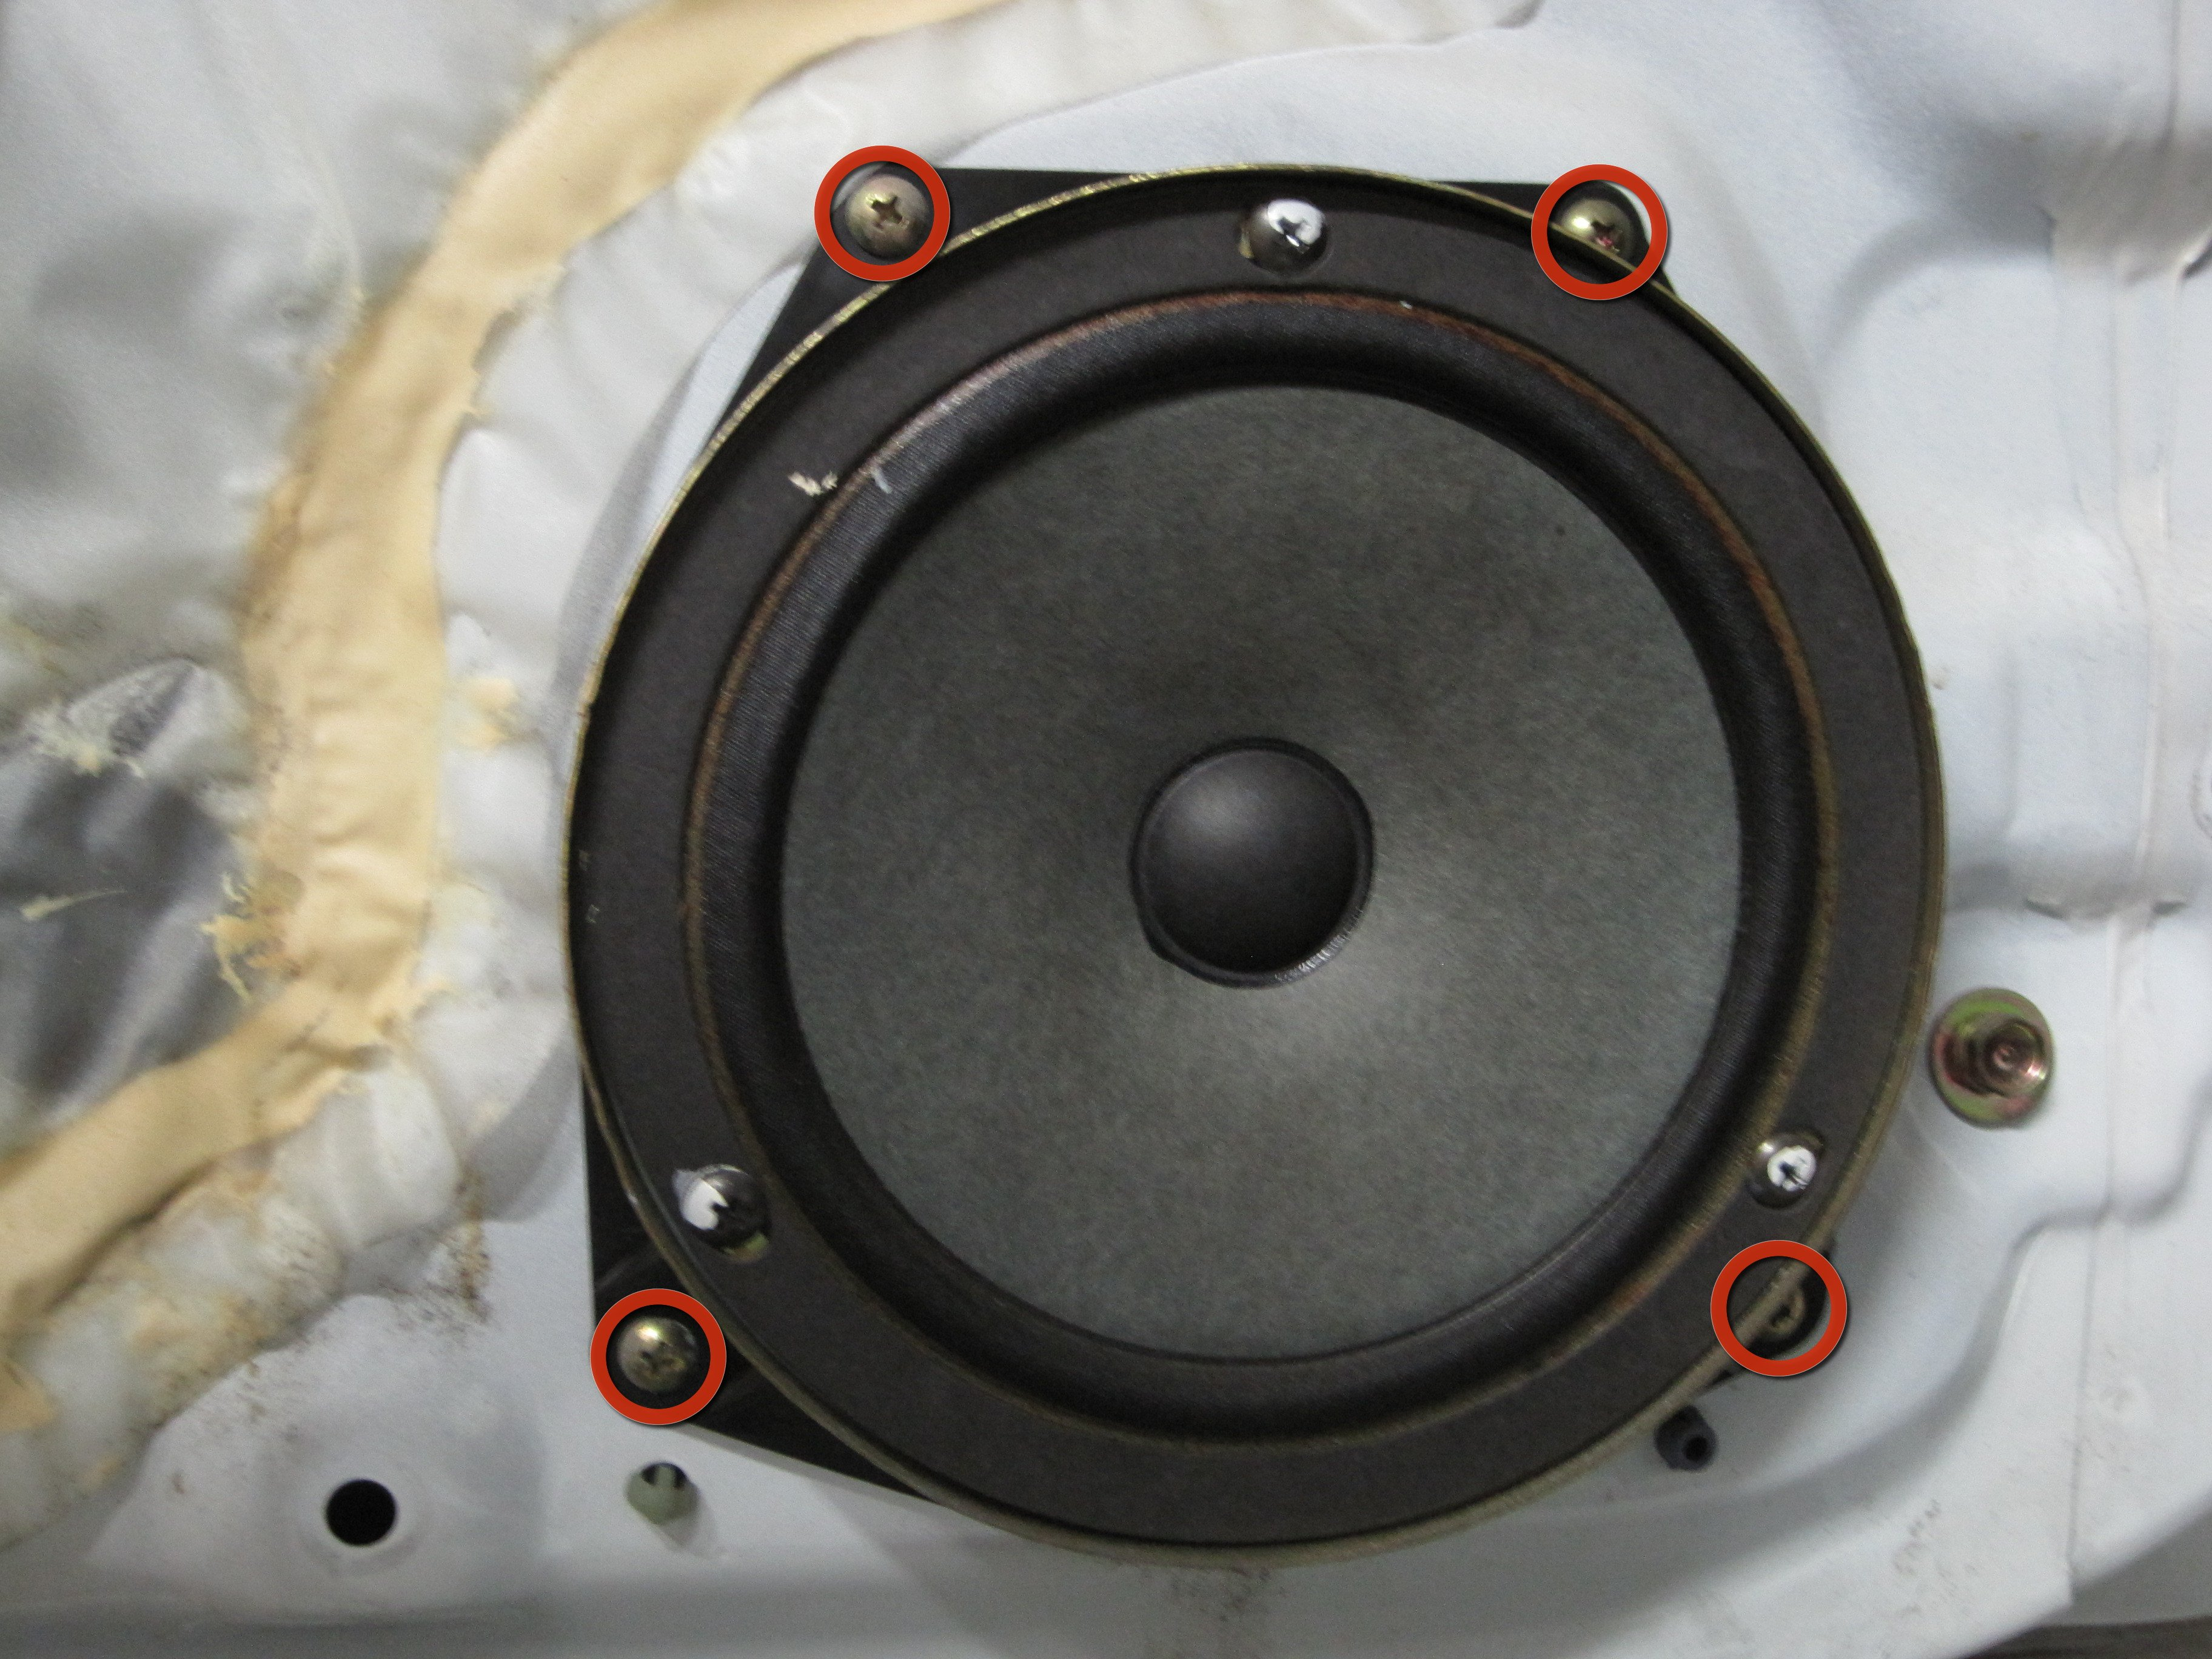 1994 2001 Acura Integra Front Speaker Replacement 1994 1995 1996 1997 1998 1999 2000 2001 Ifixit Repair Guide